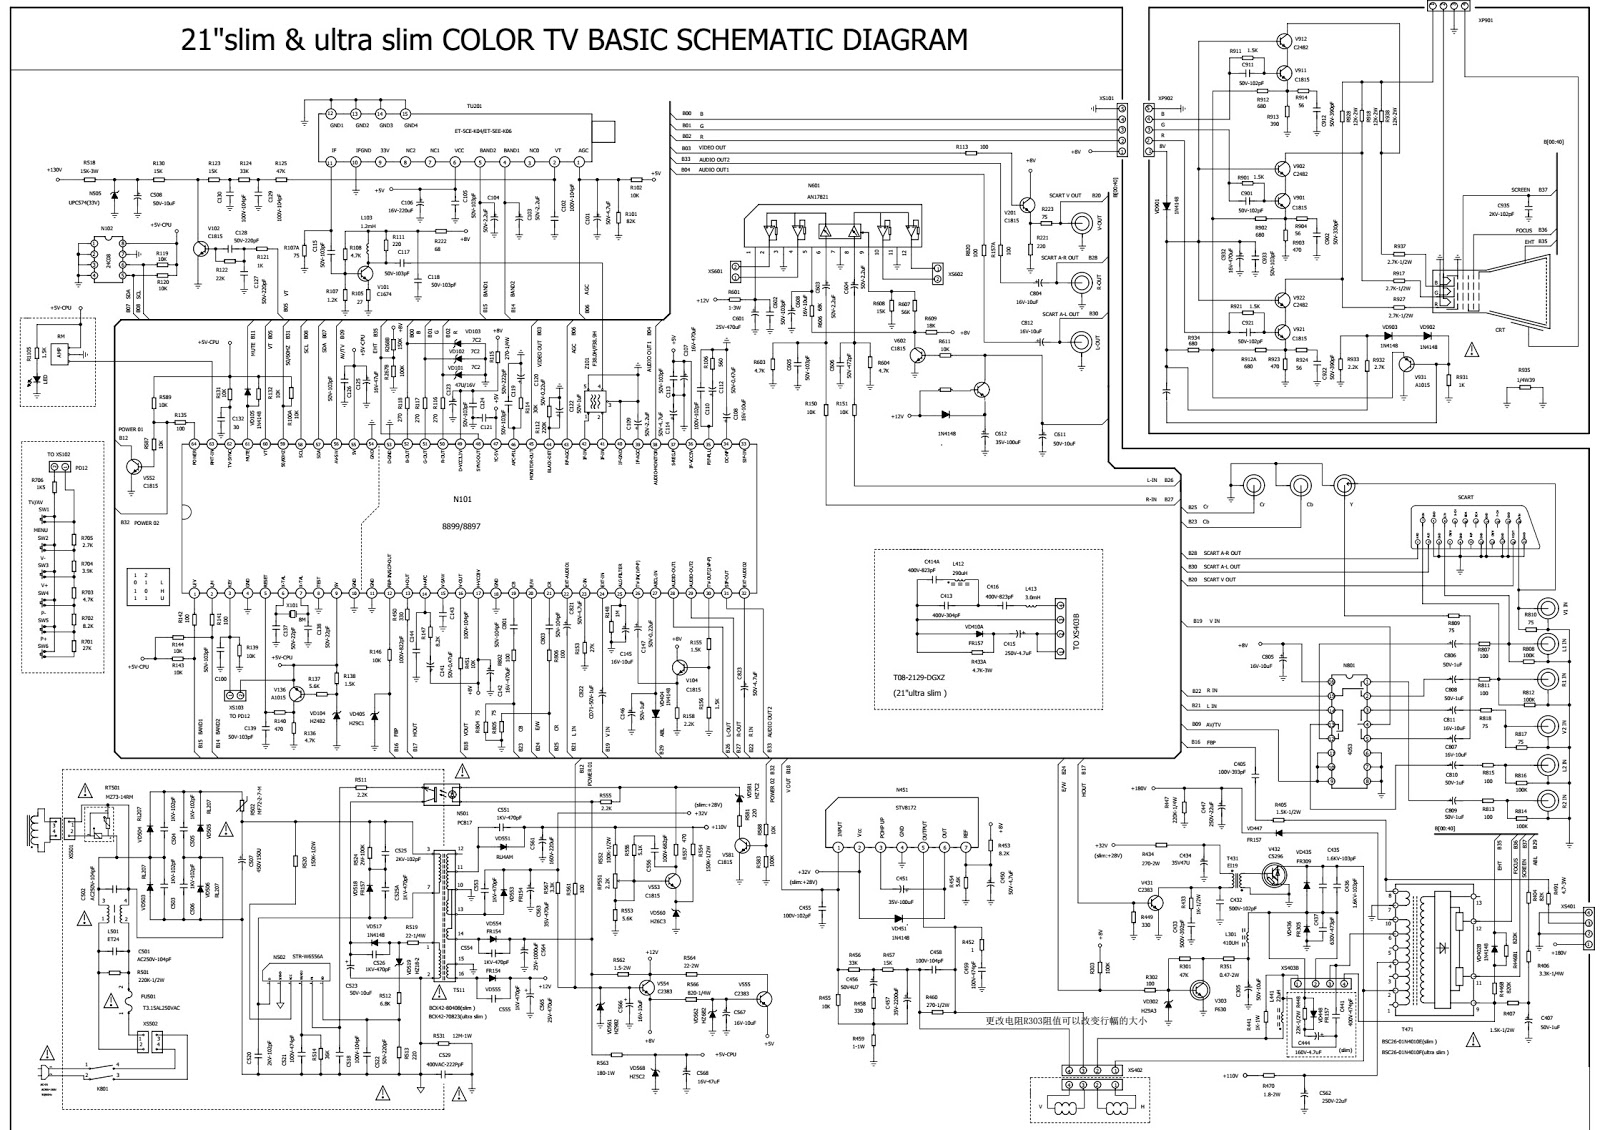 55 Samsung Tv Wiring Diagram - Wiring Diagram •